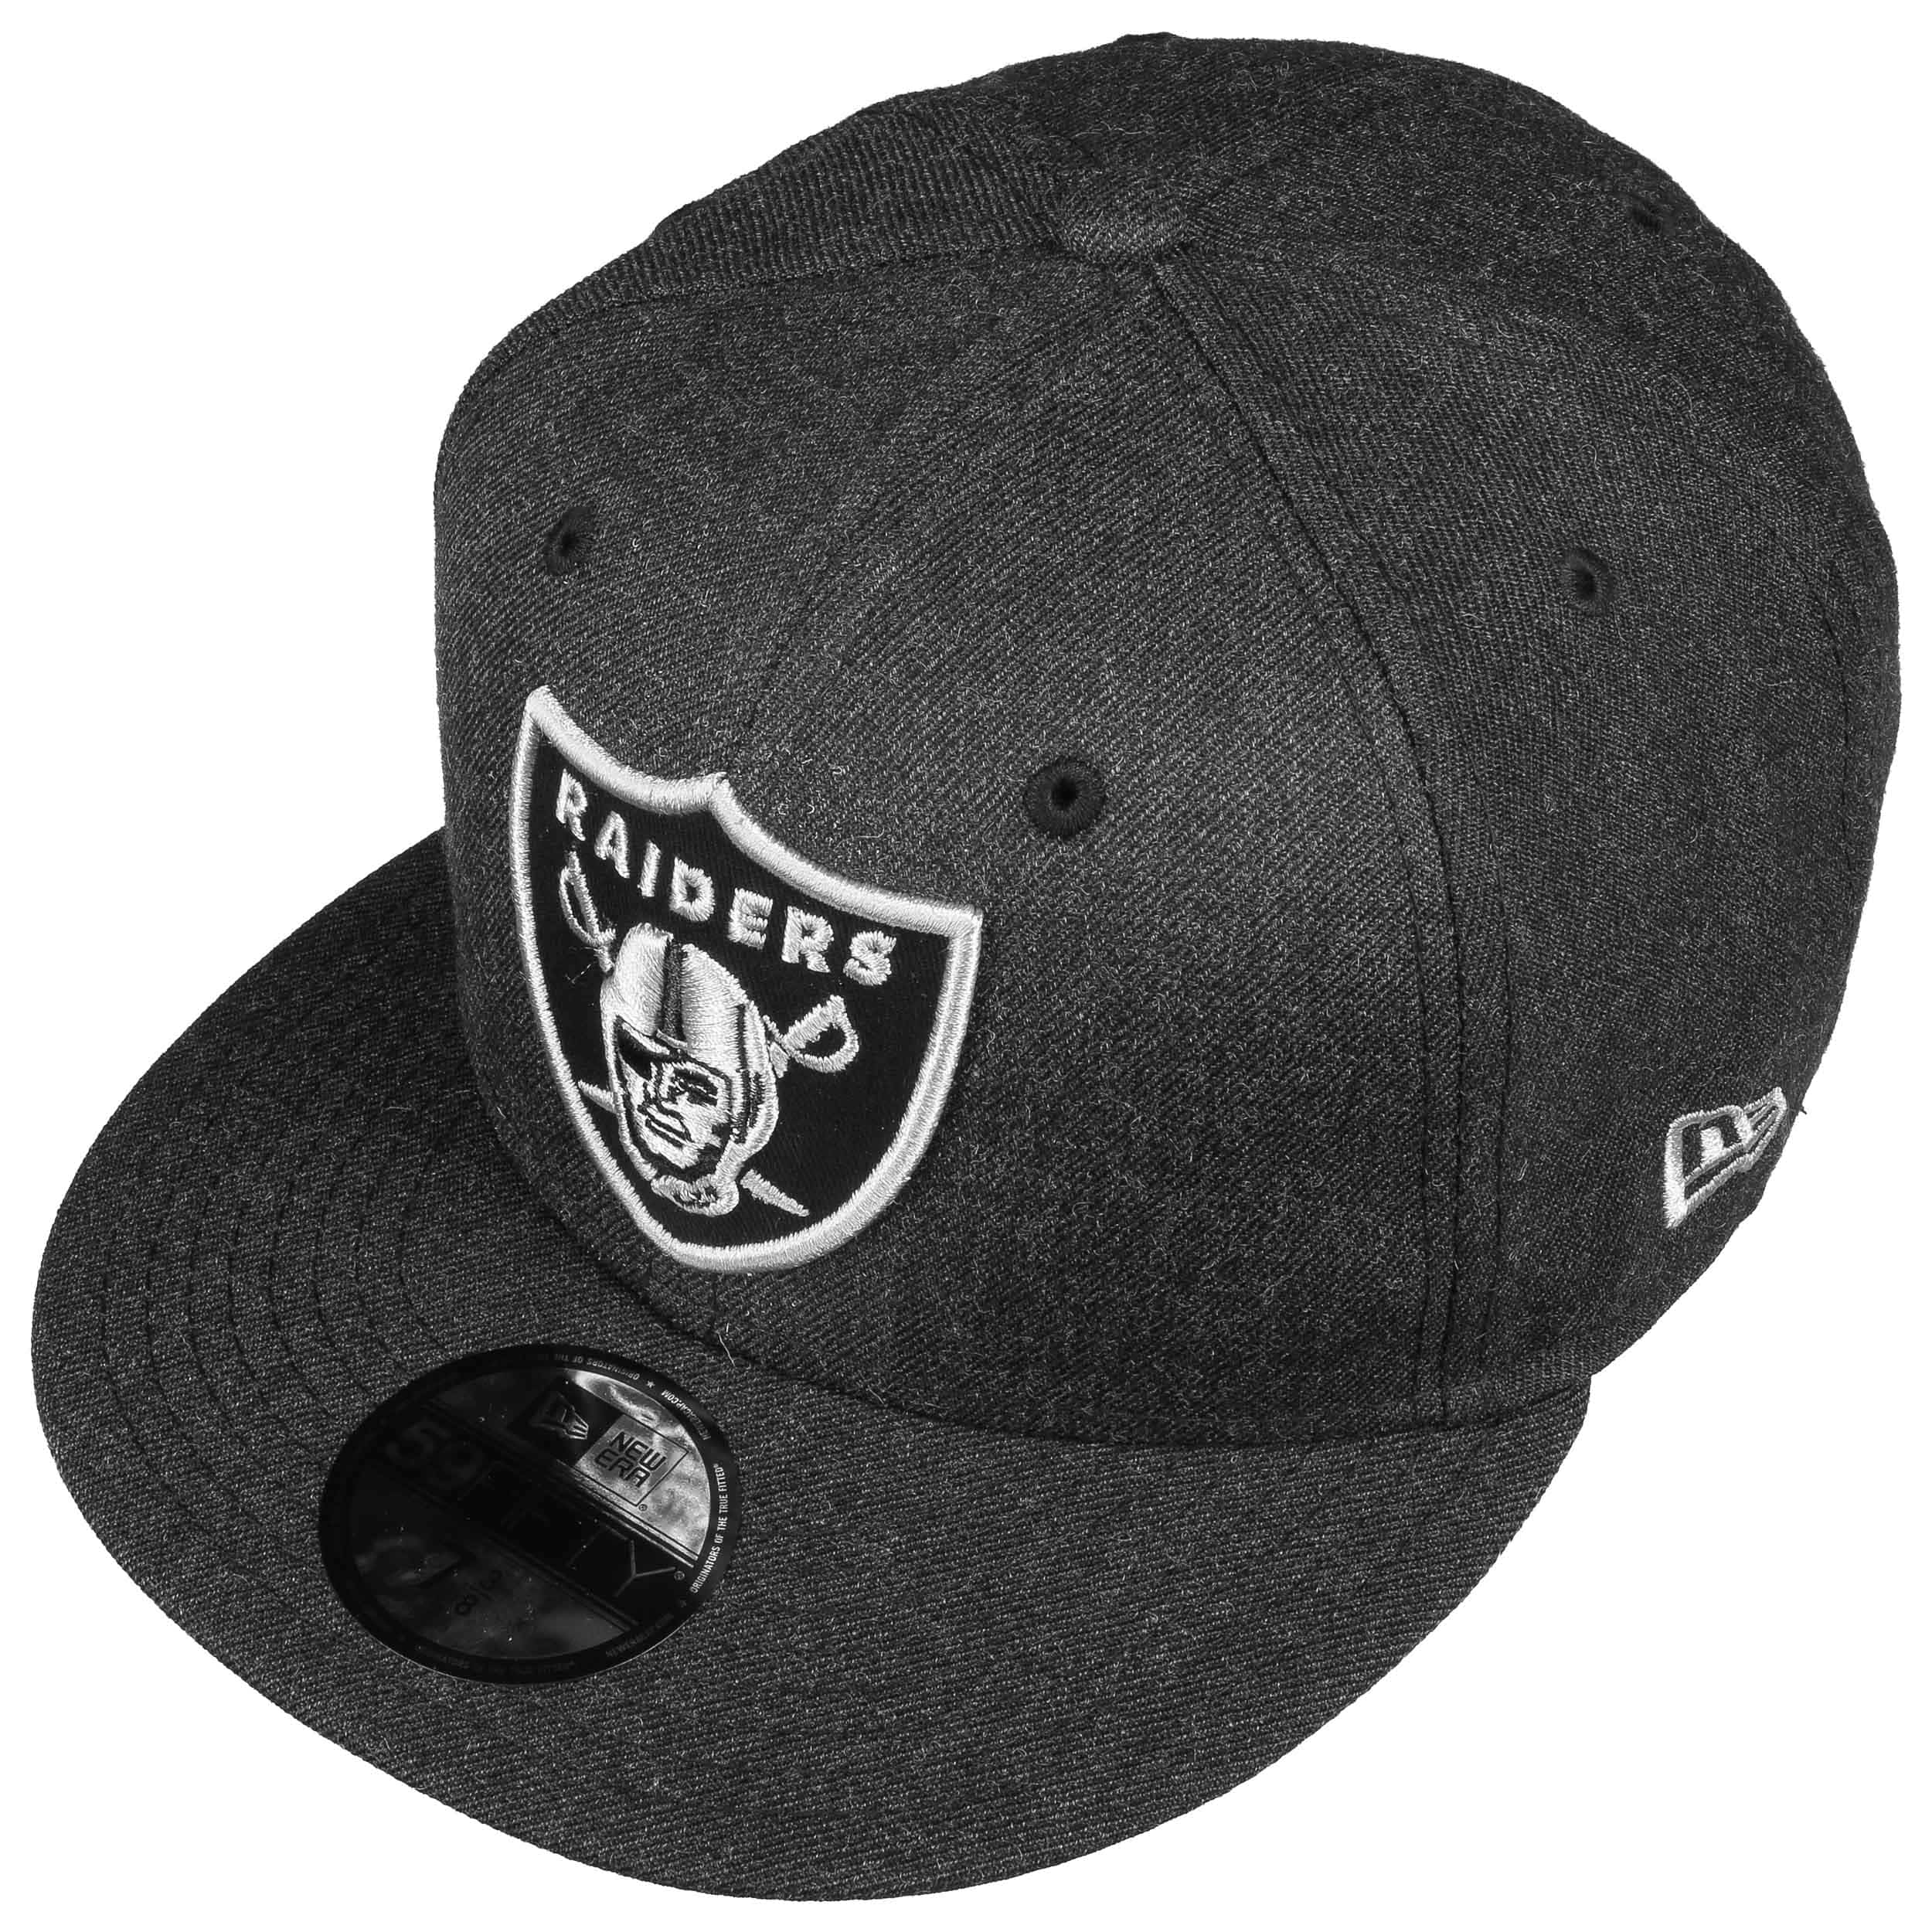 40b8ec3b5 59Fifty NFL Heather Raiders Cap by New Era - black 1 ...